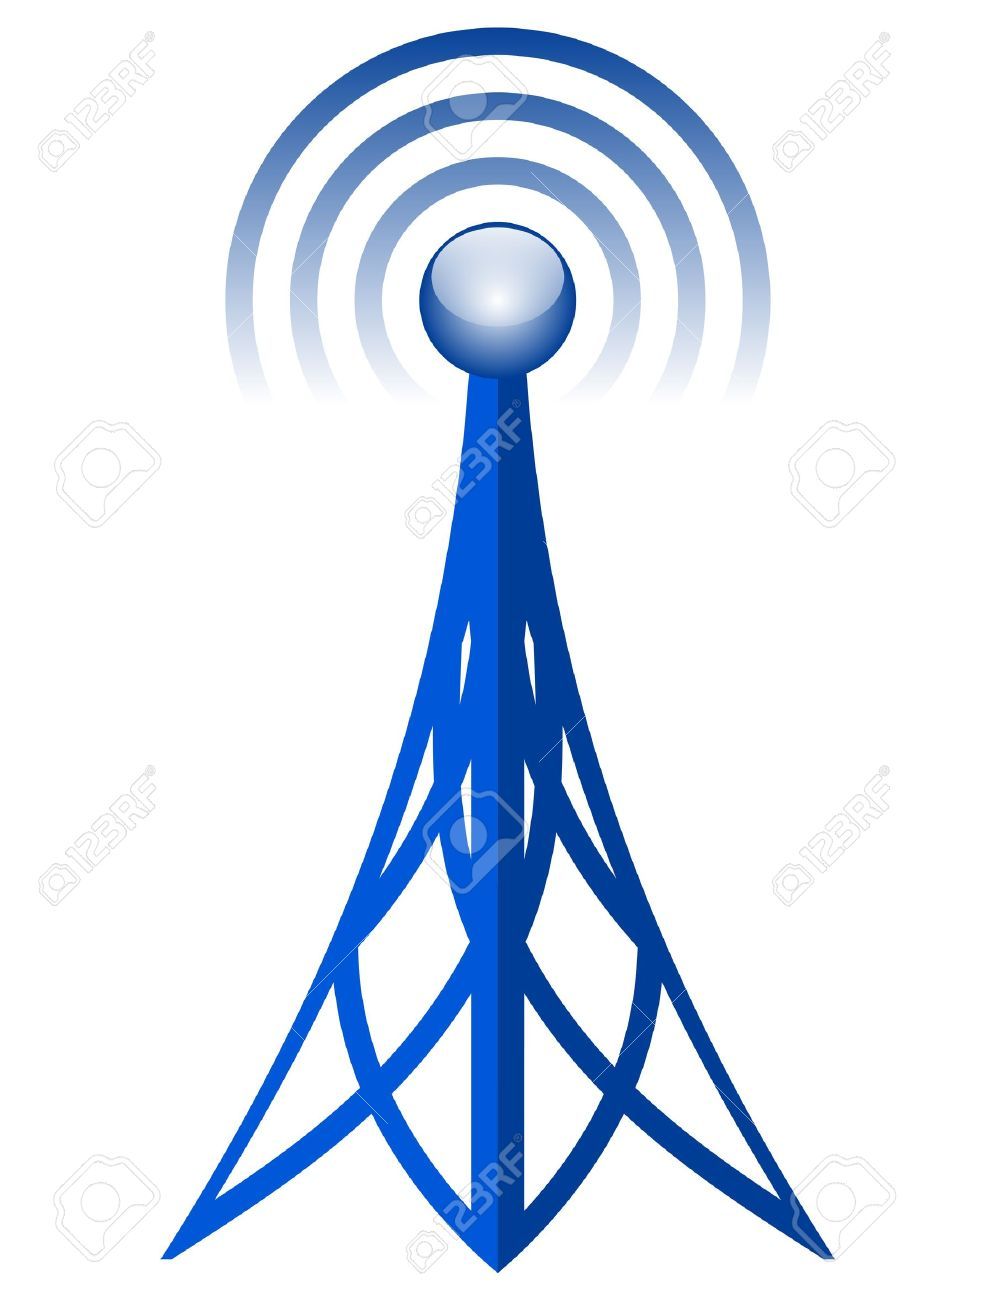 Broadcast Tower Vector Vector - Vector antenna icon